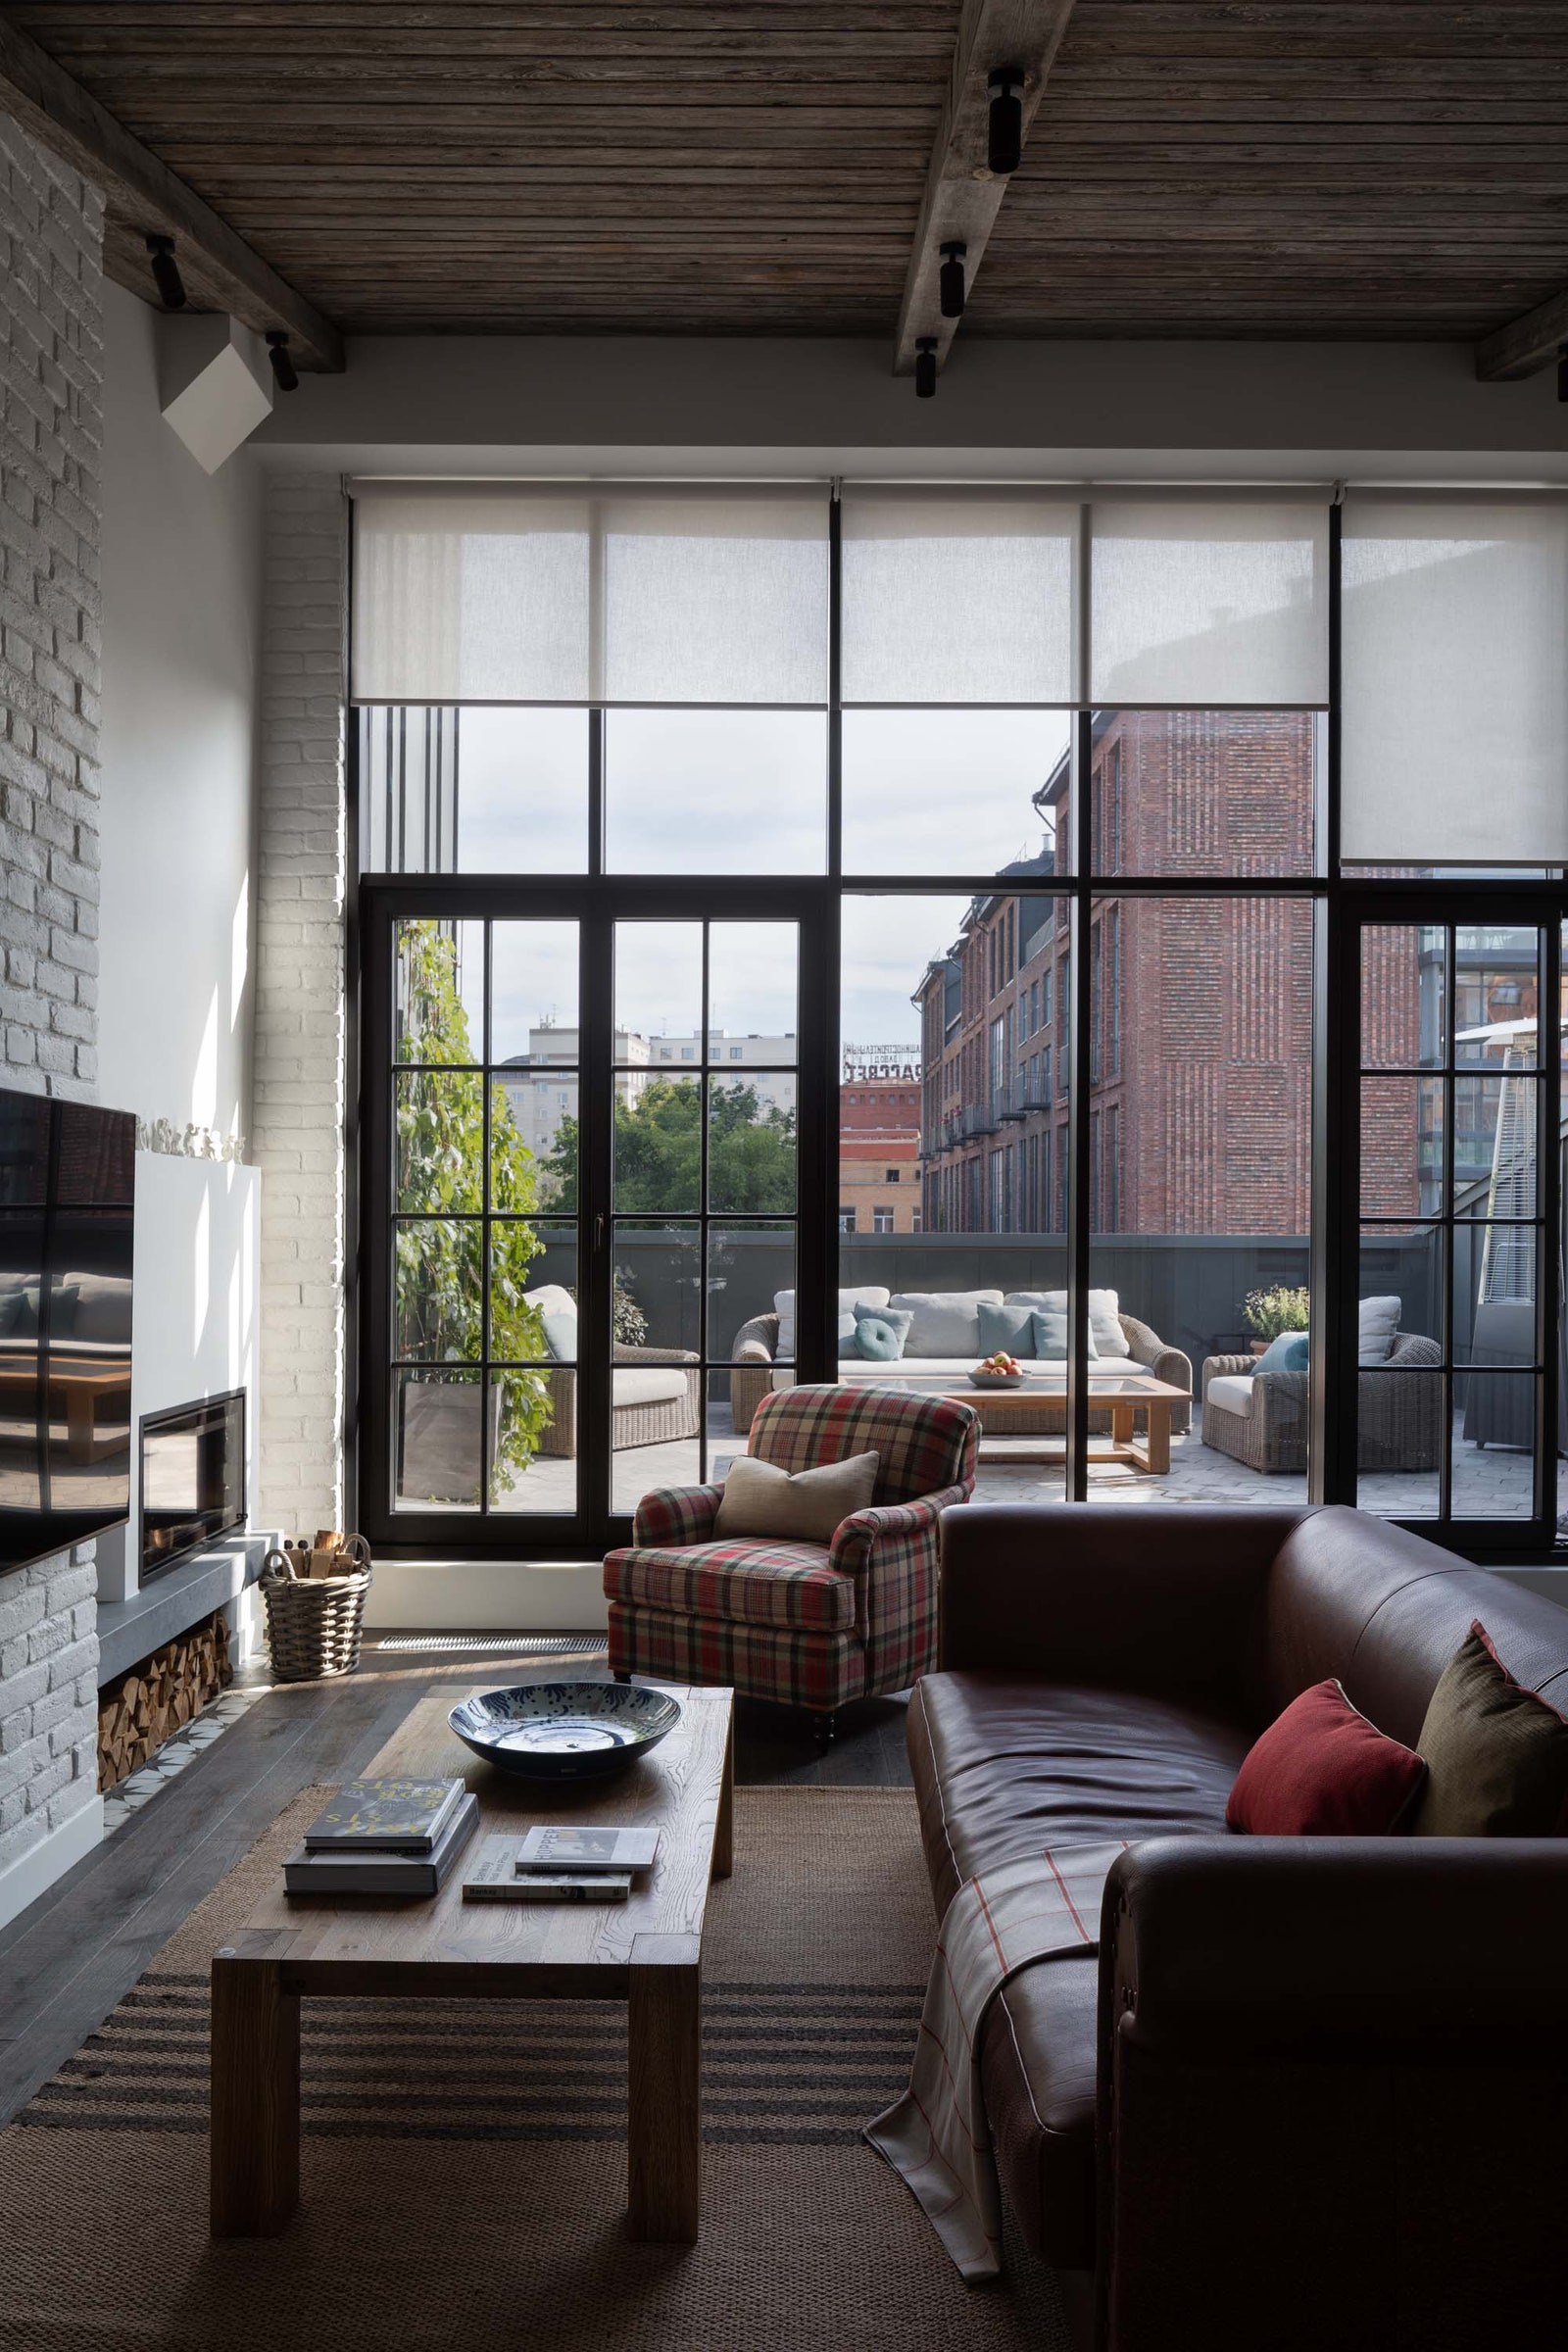 .  Baxter   Enere.it  Kravet   Ralph Lauren Deluxe Home Creation   Restoration Hardware    Labyrinthe Interiors  Andrew...